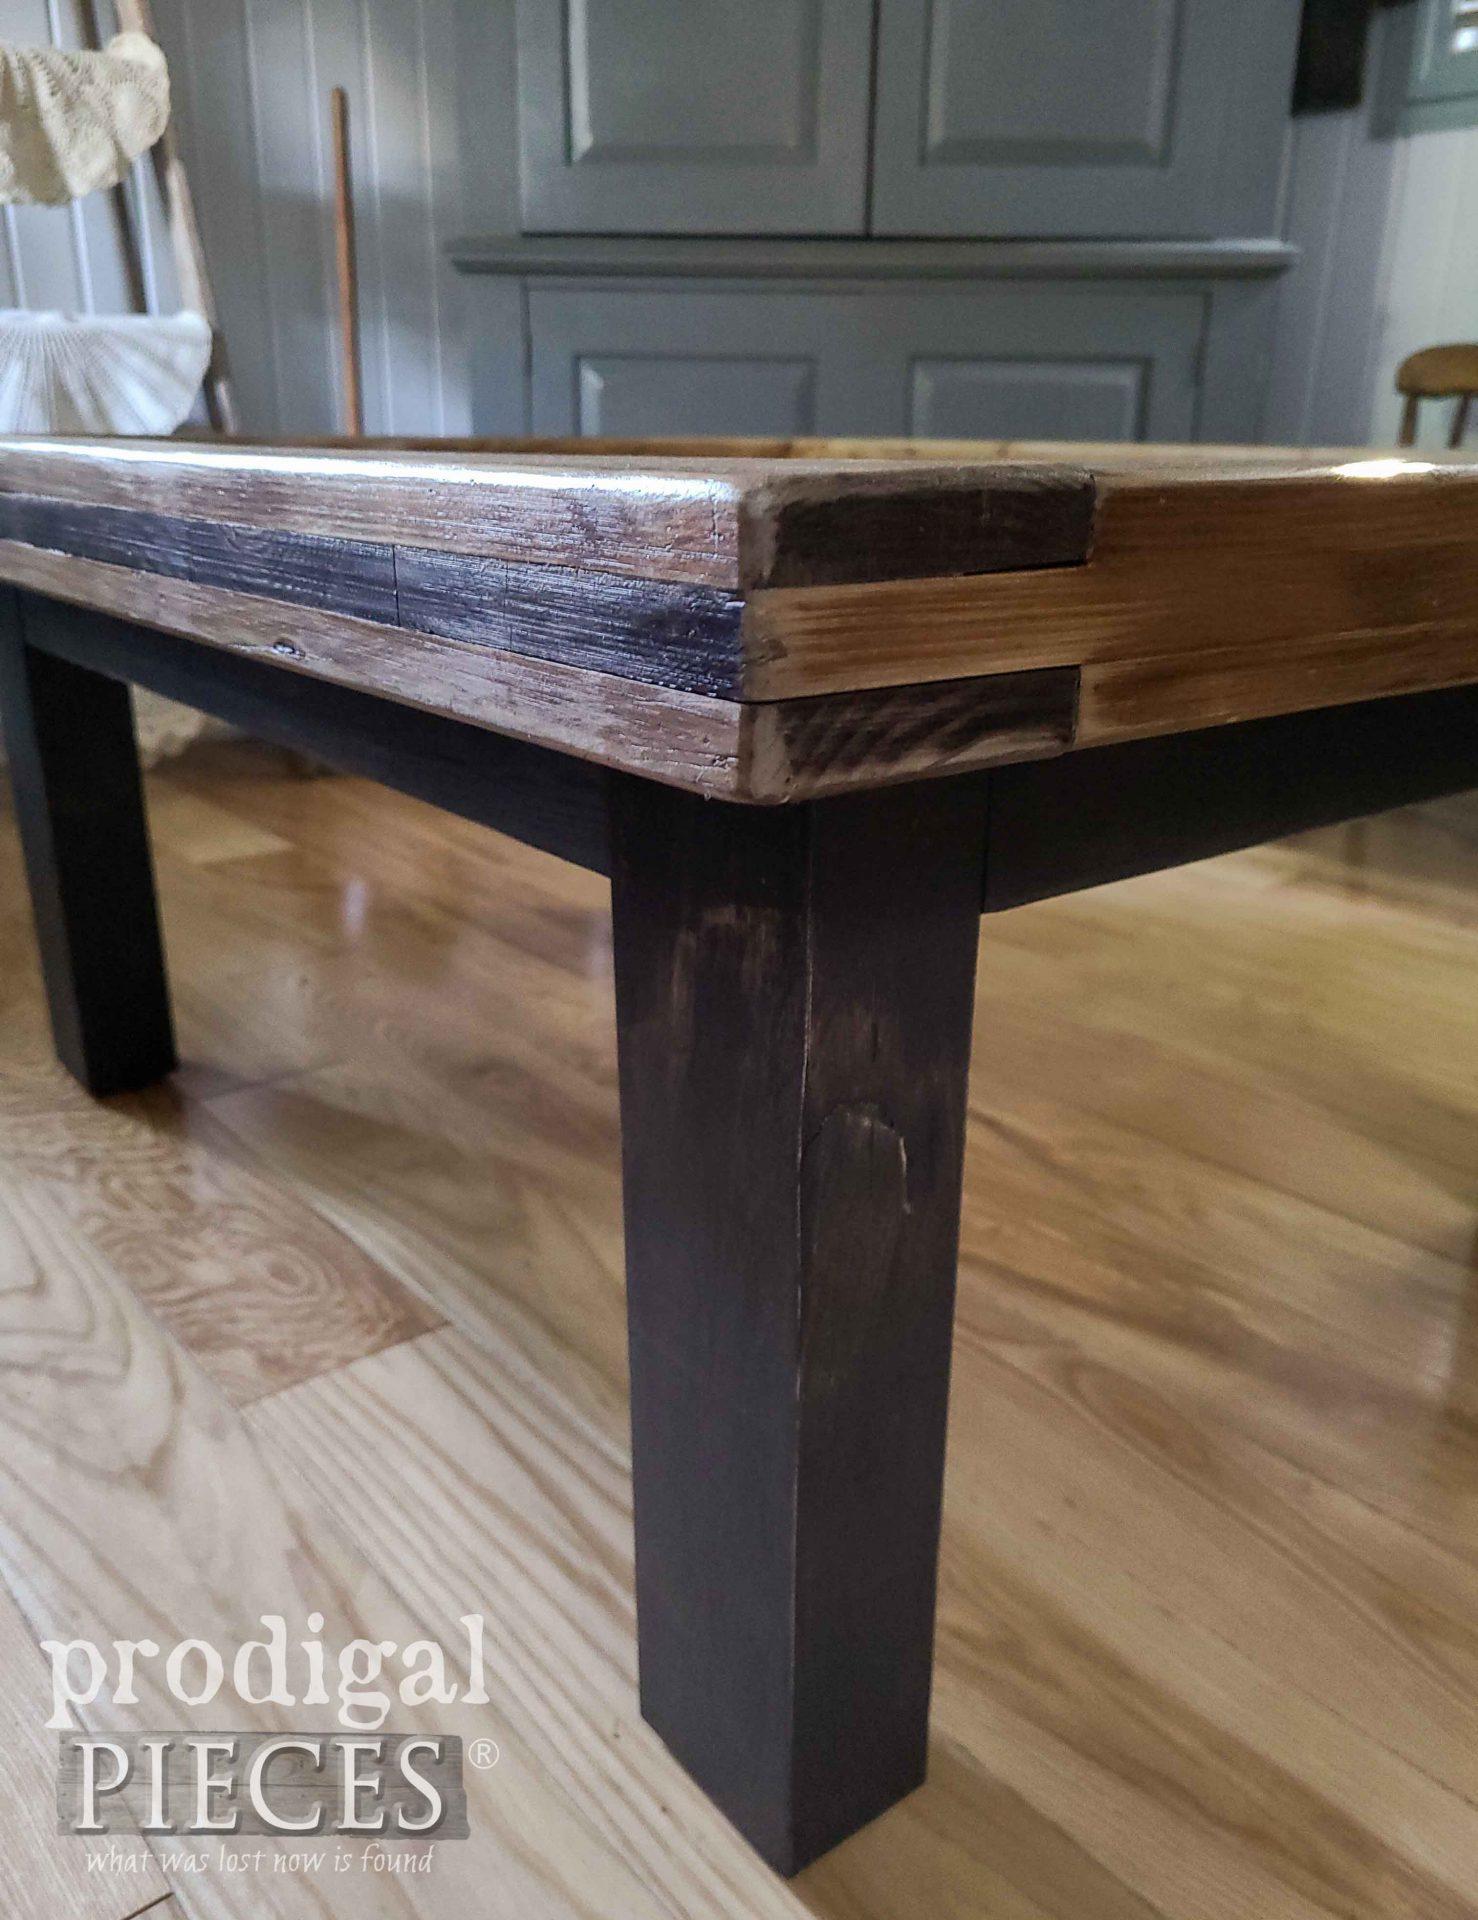 Handmade Coffee Table Built by Larissa of Prodigal Pieces   prodigalpieces.com #prodigalpieces #diy #farmhouse #furniture #home #homedecor